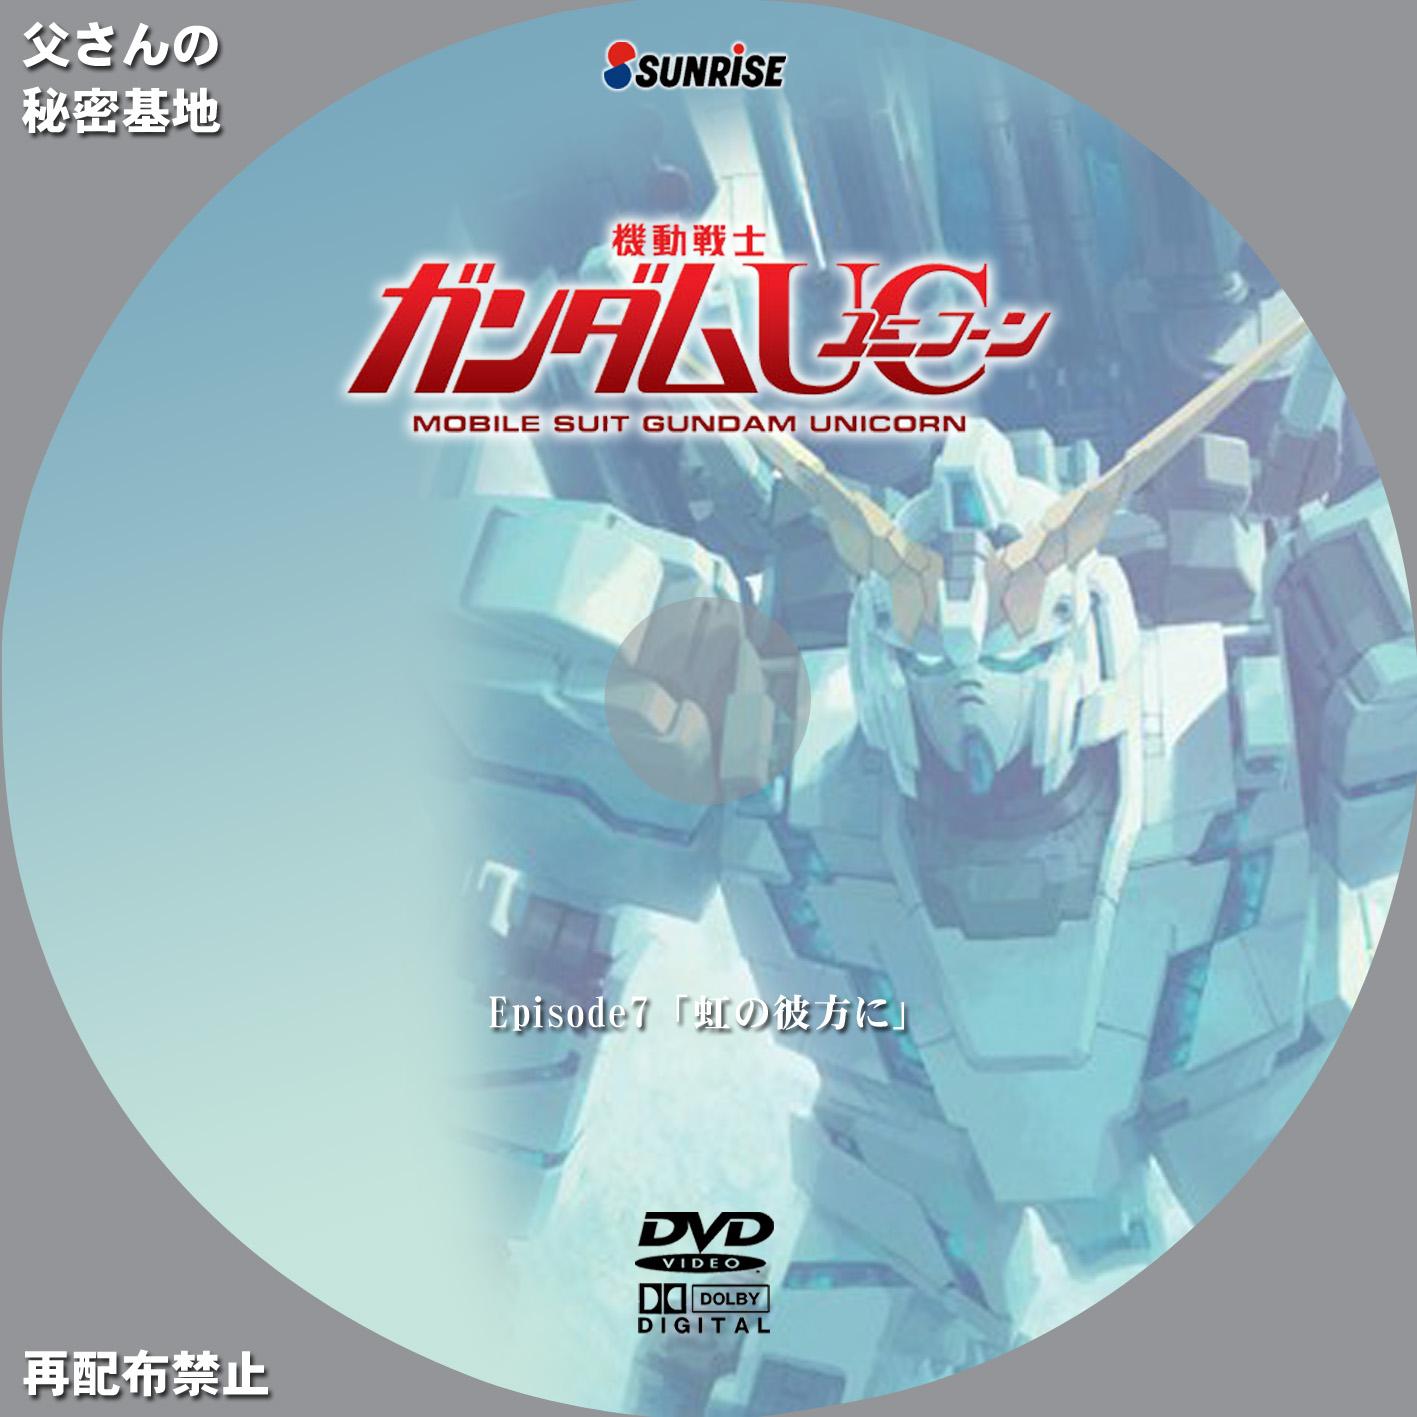 UNICORN_07_DVD.jpg